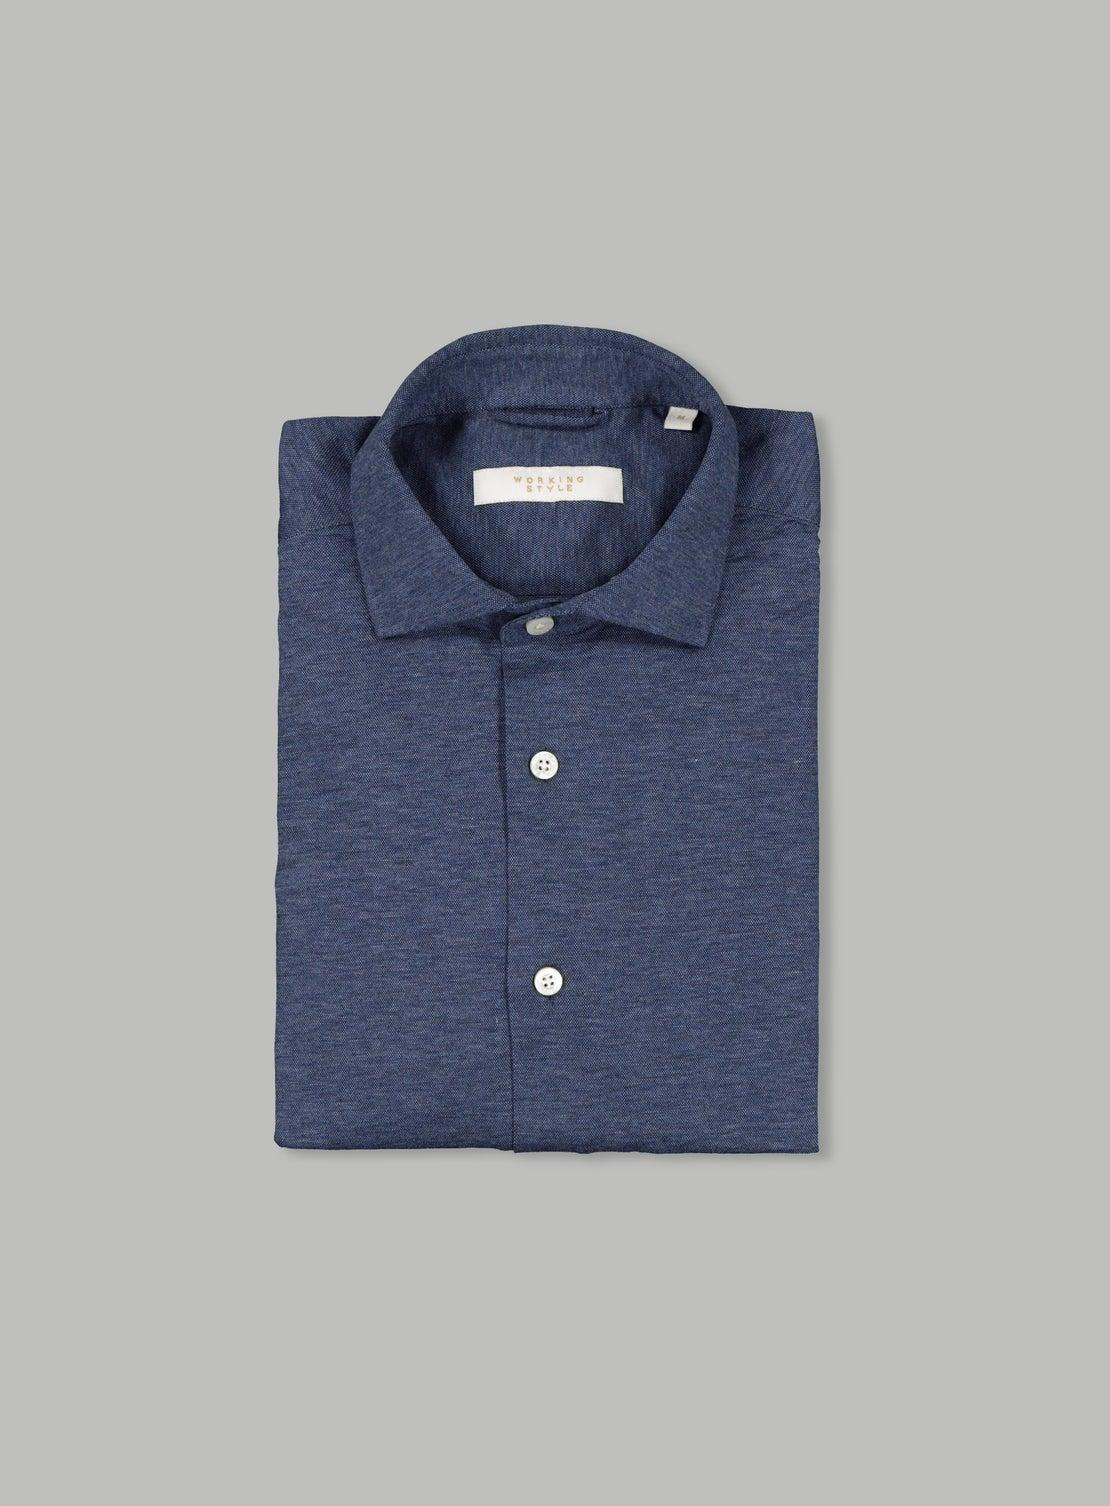 Navy Fleck Knit Shirt